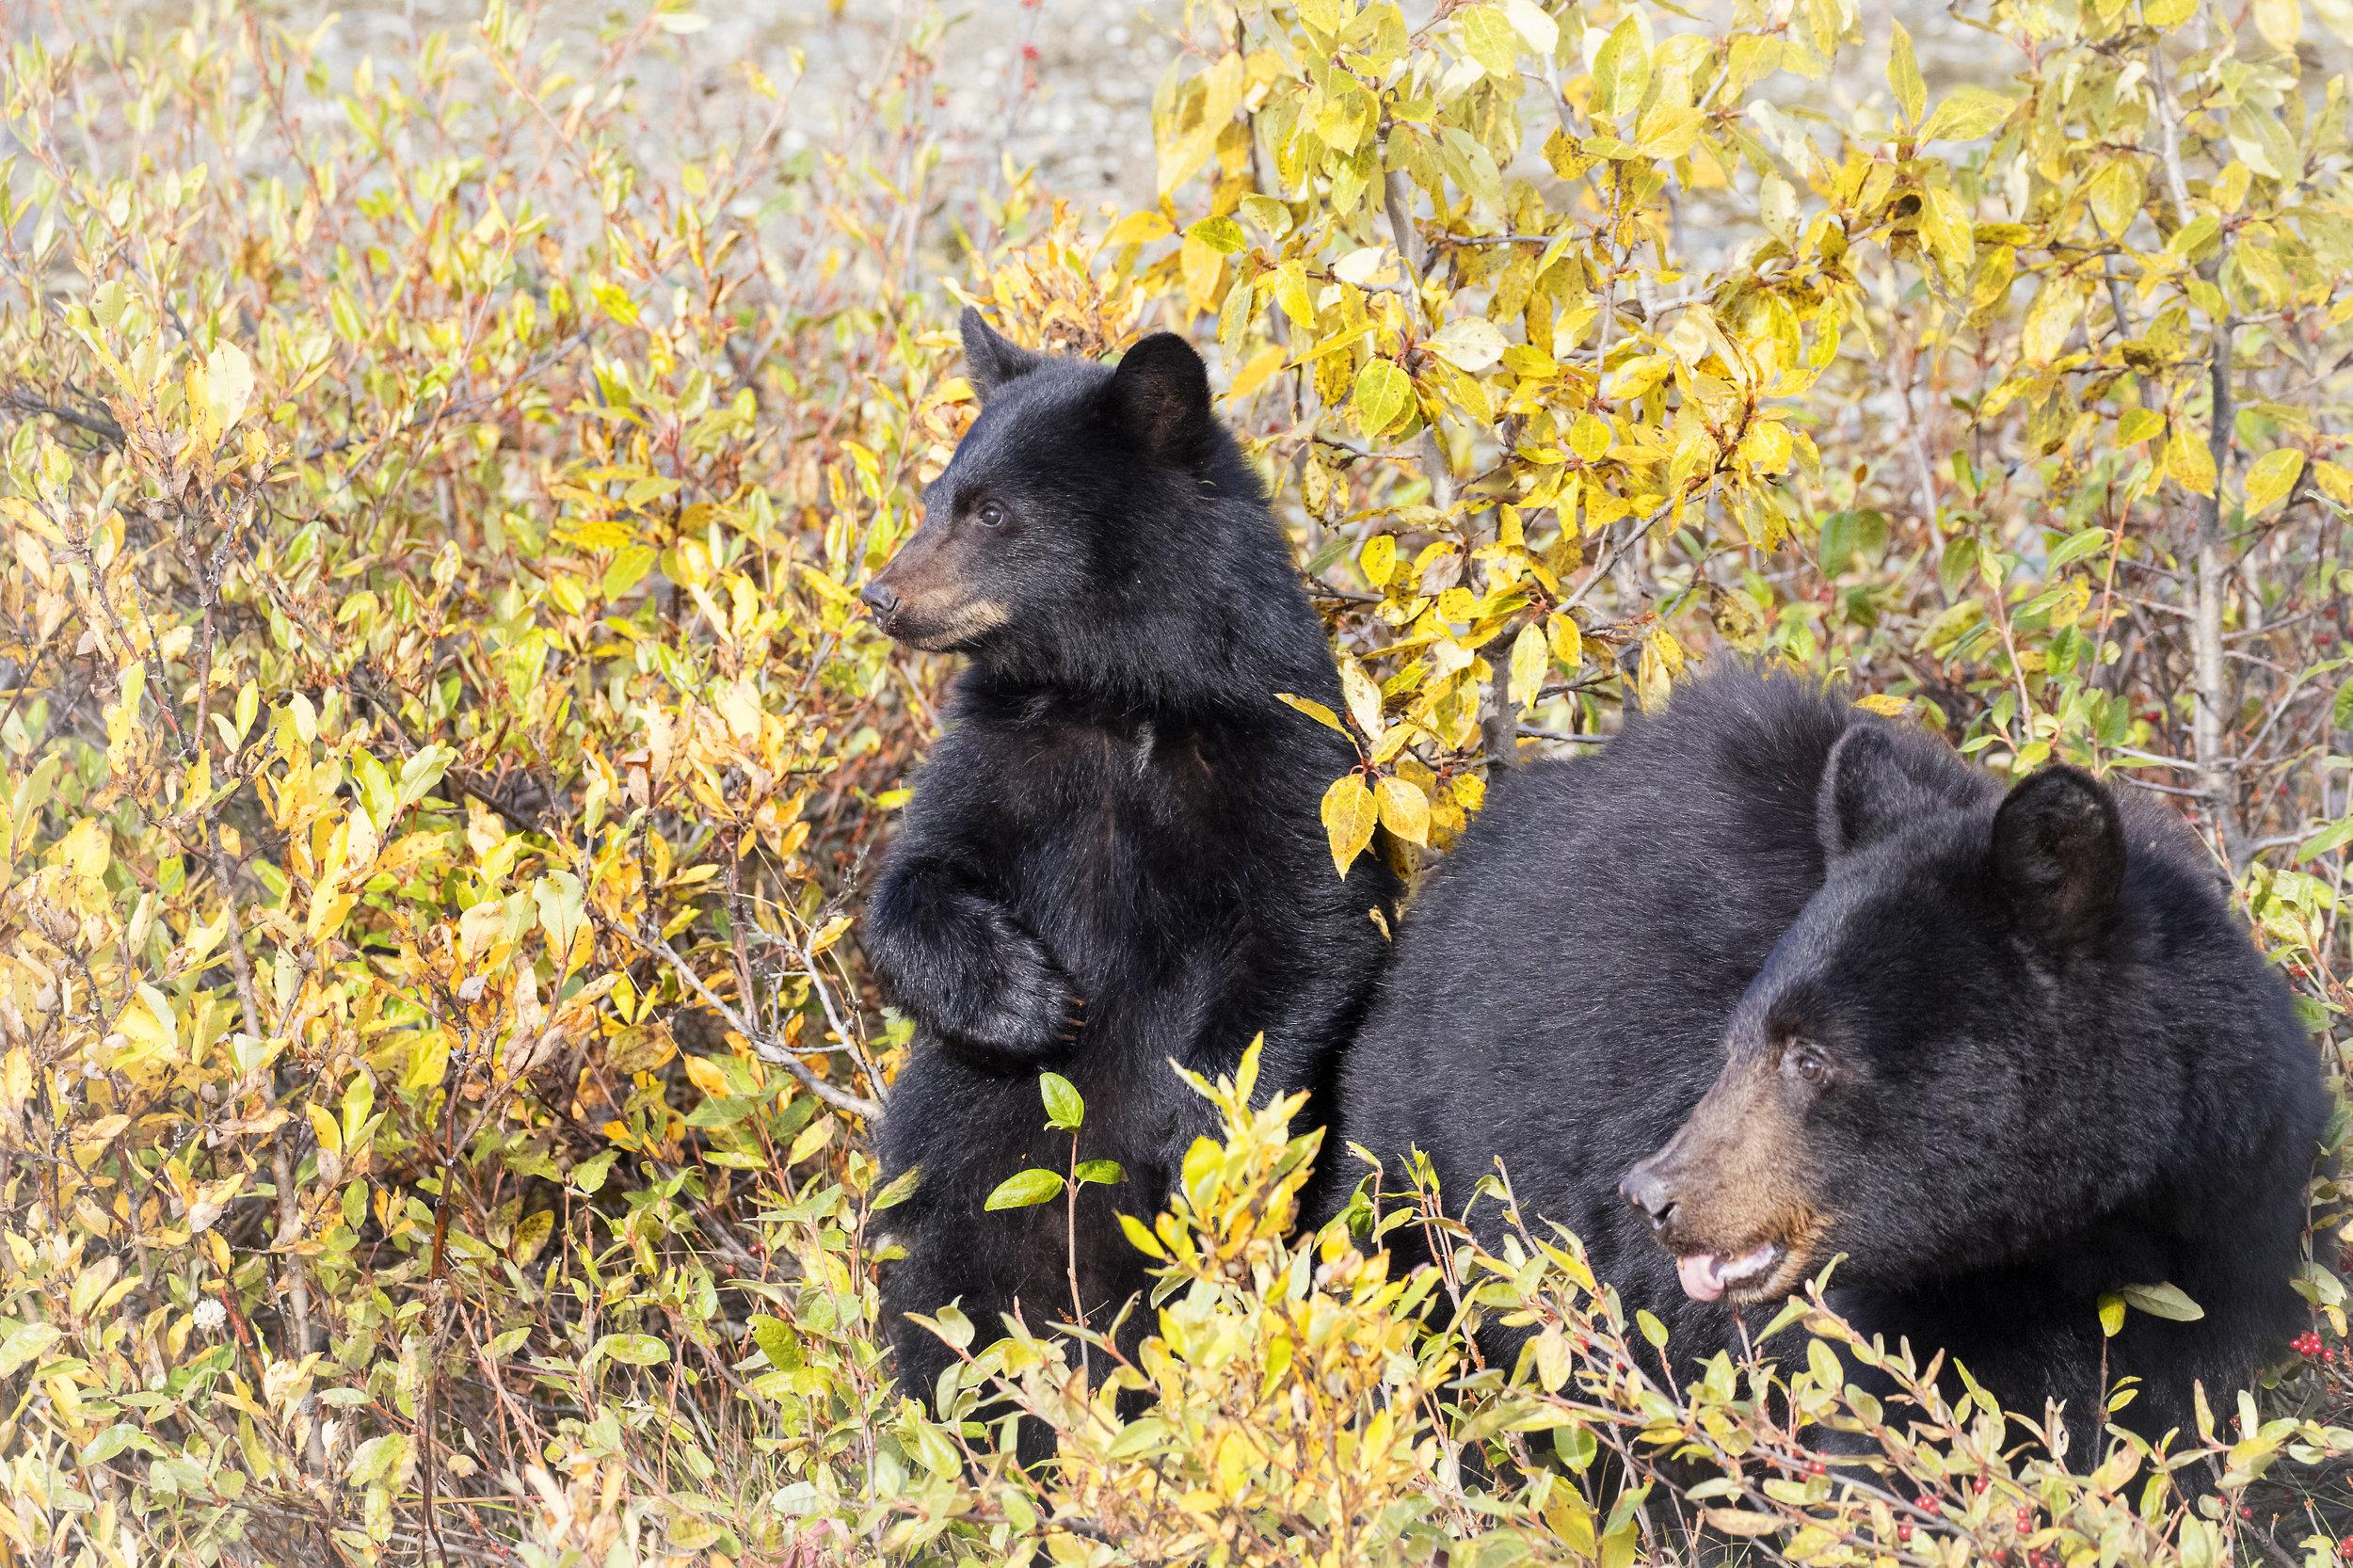 Black Bear Mom and Cub - Across the Blue Planet